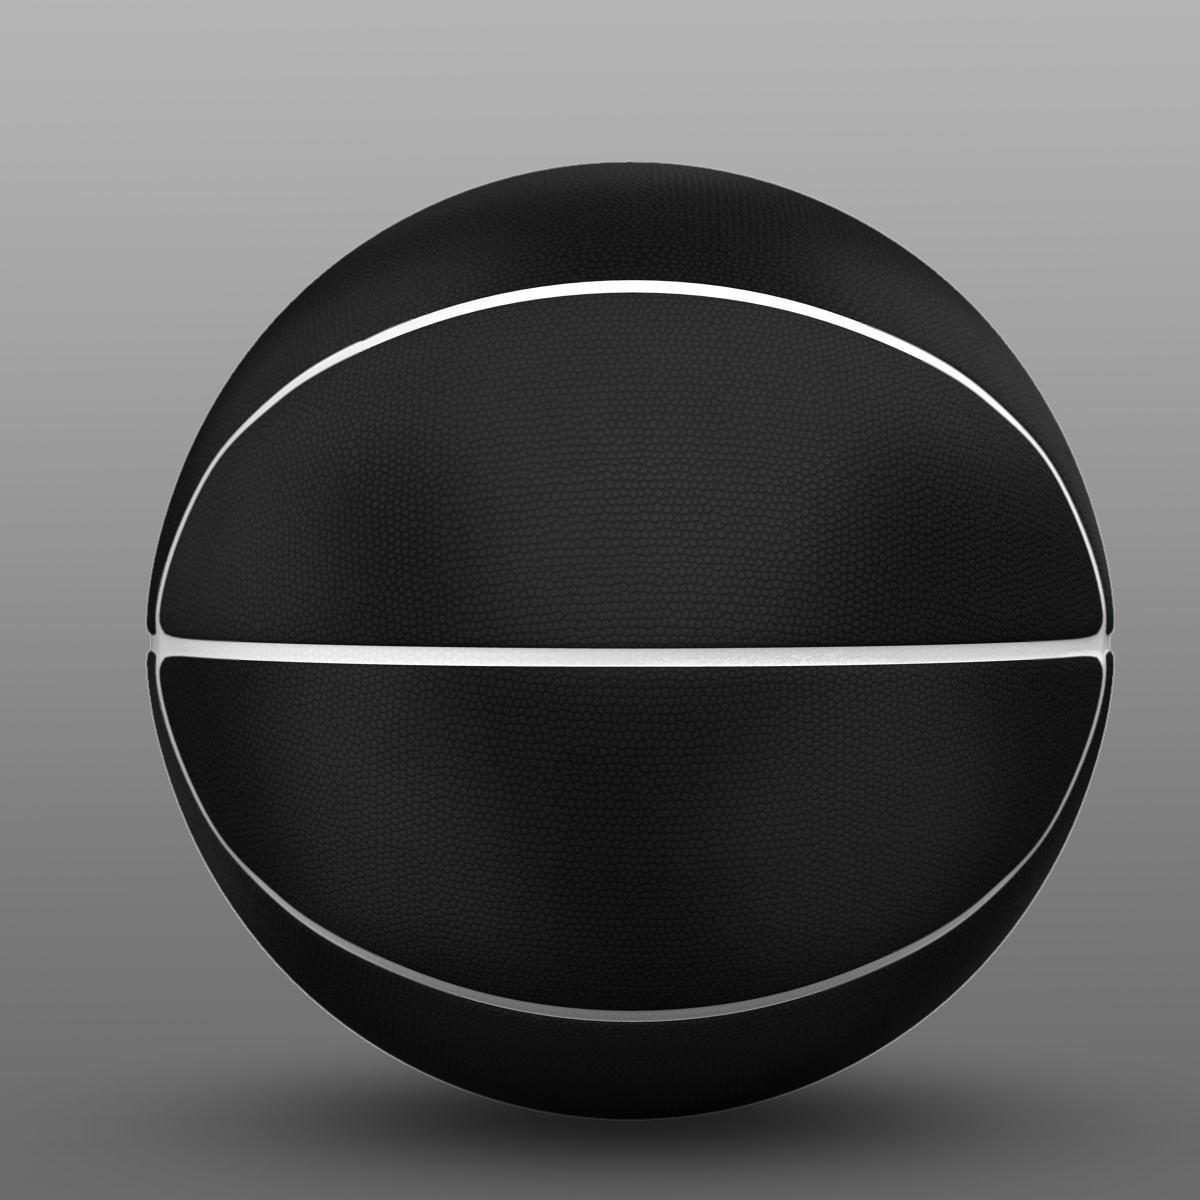 black basketball ball 3d model 3ds max fbx c4d ma mb obj 164938